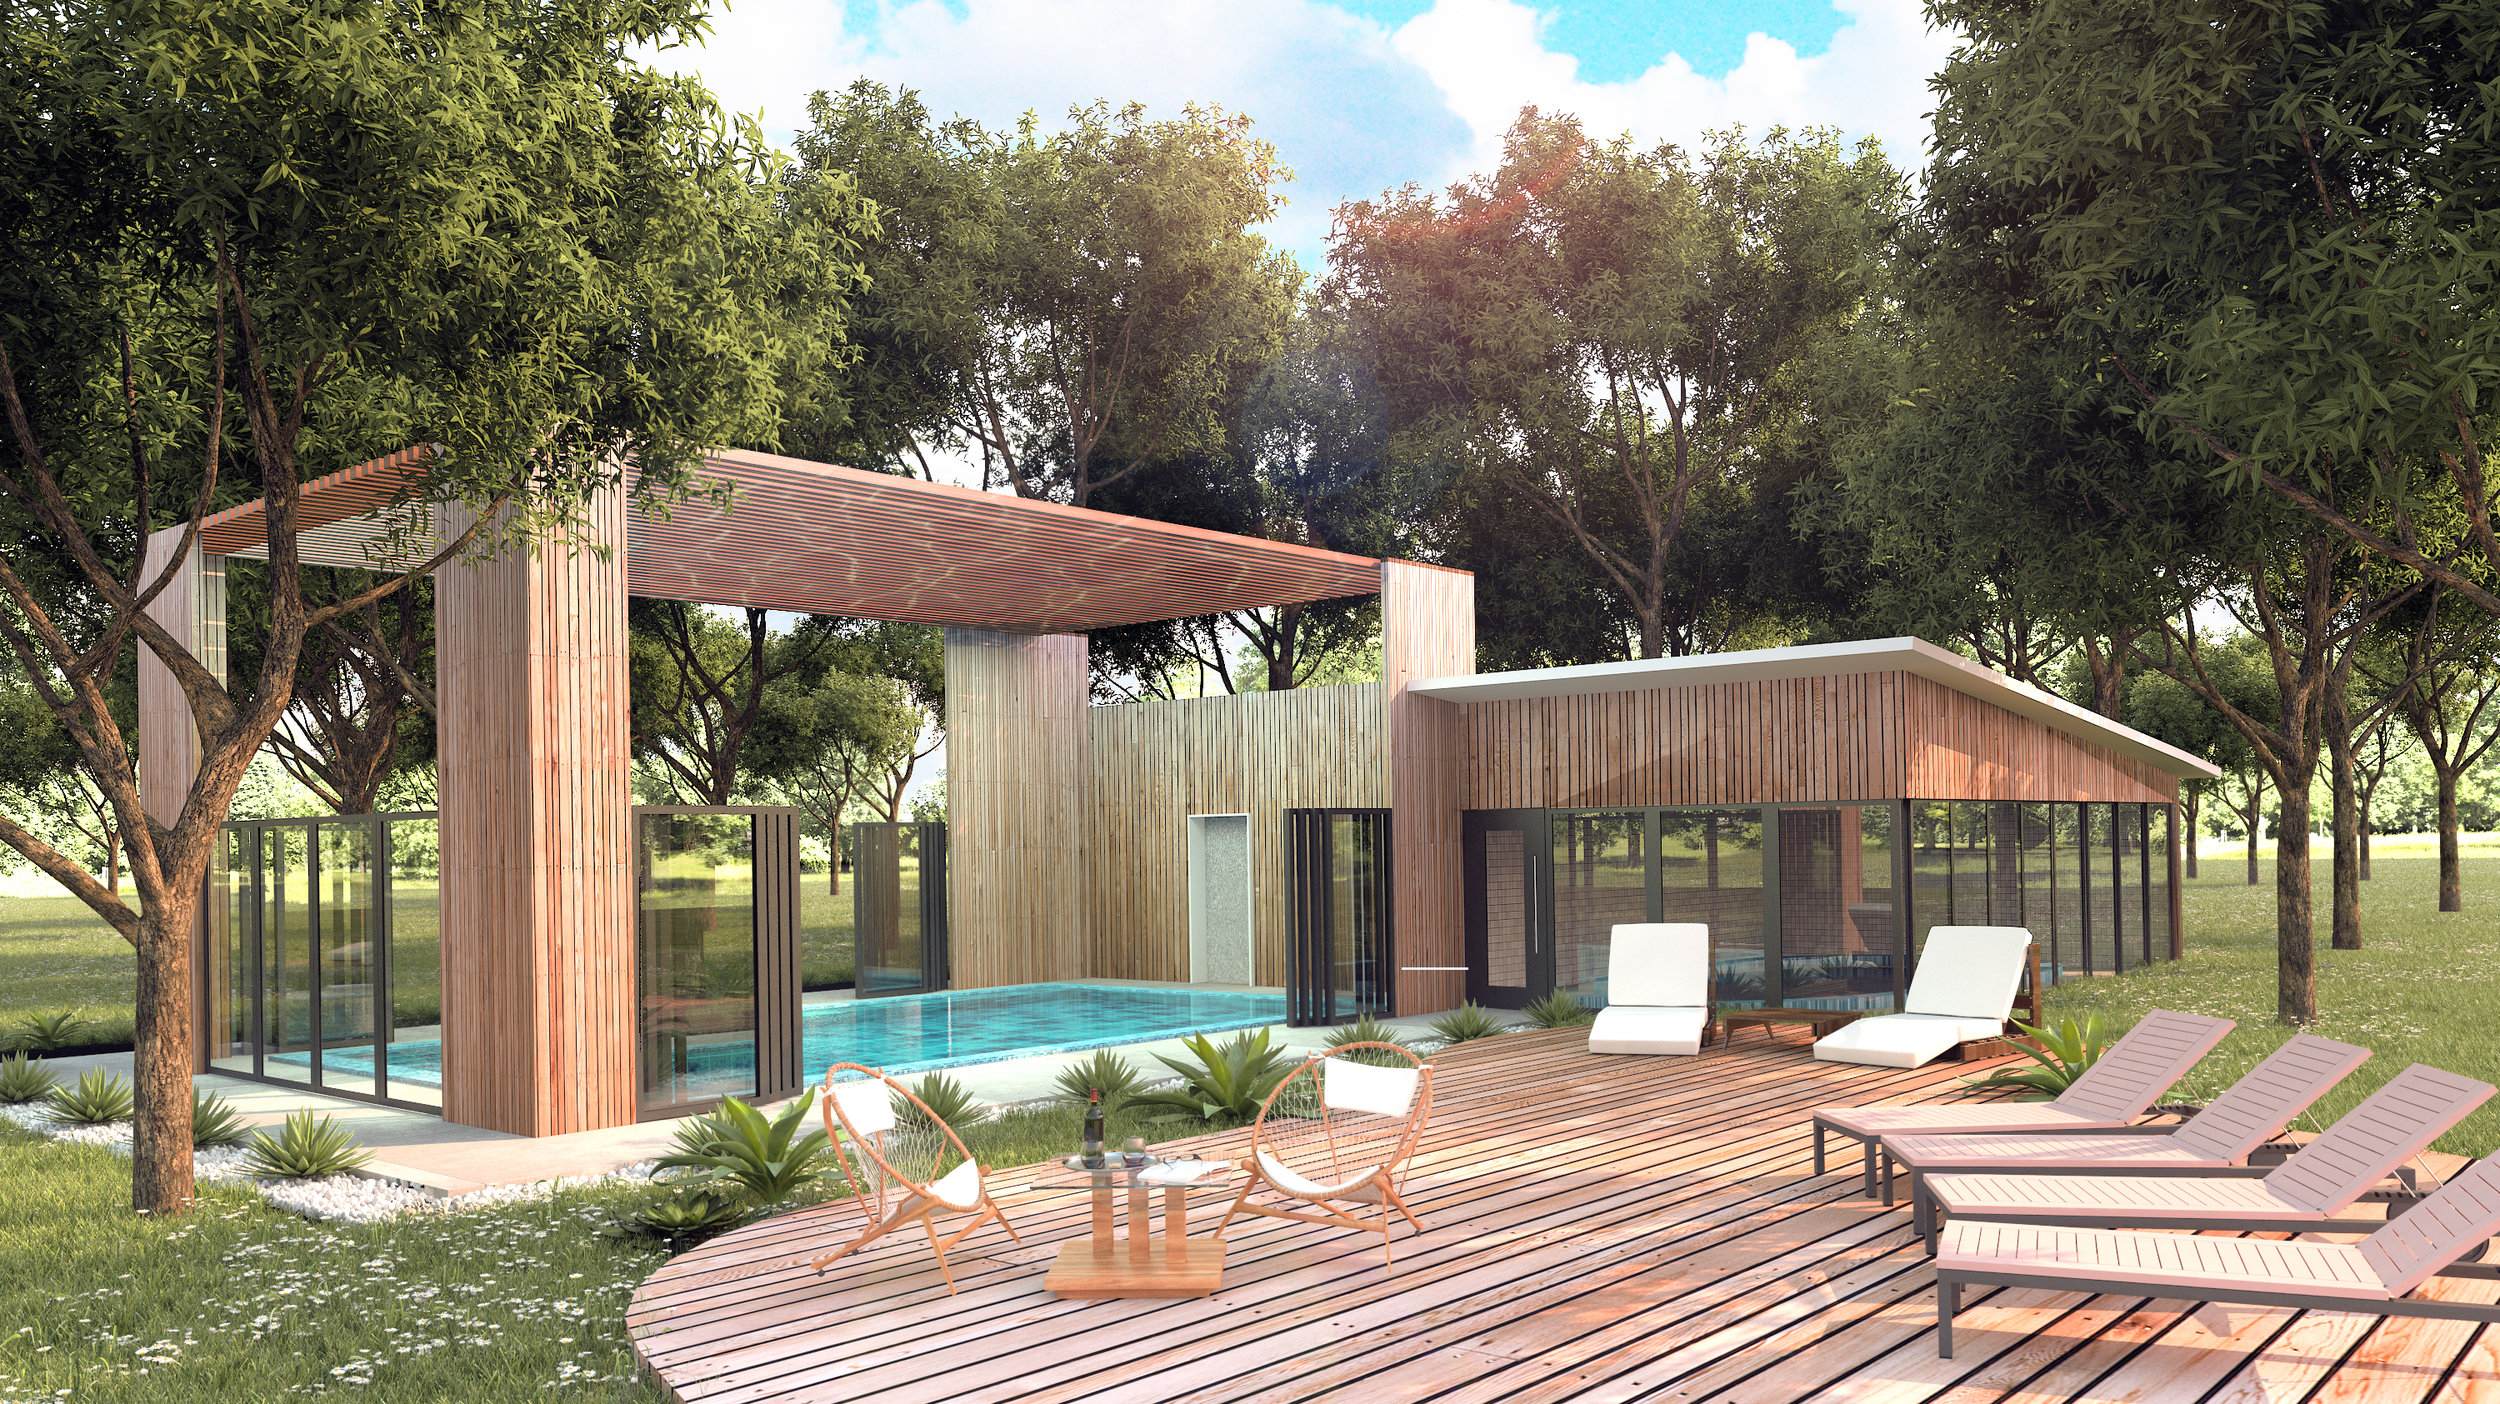 exterior_poolhouse_hd.jpg